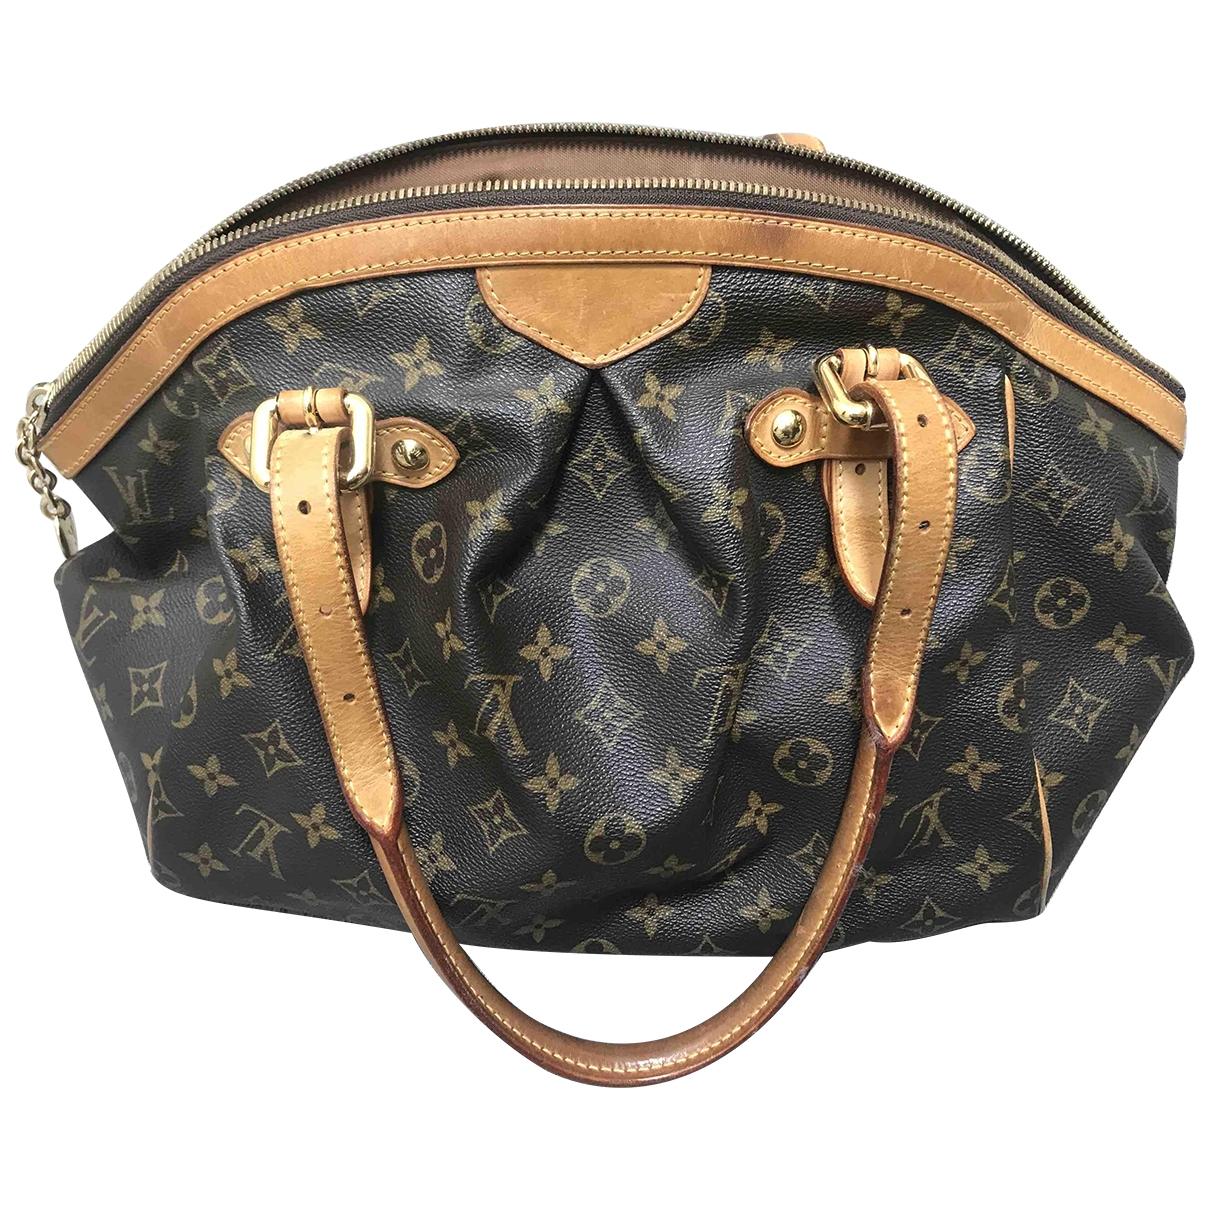 Louis Vuitton Tivoli Handtasche in  Braun Leinen